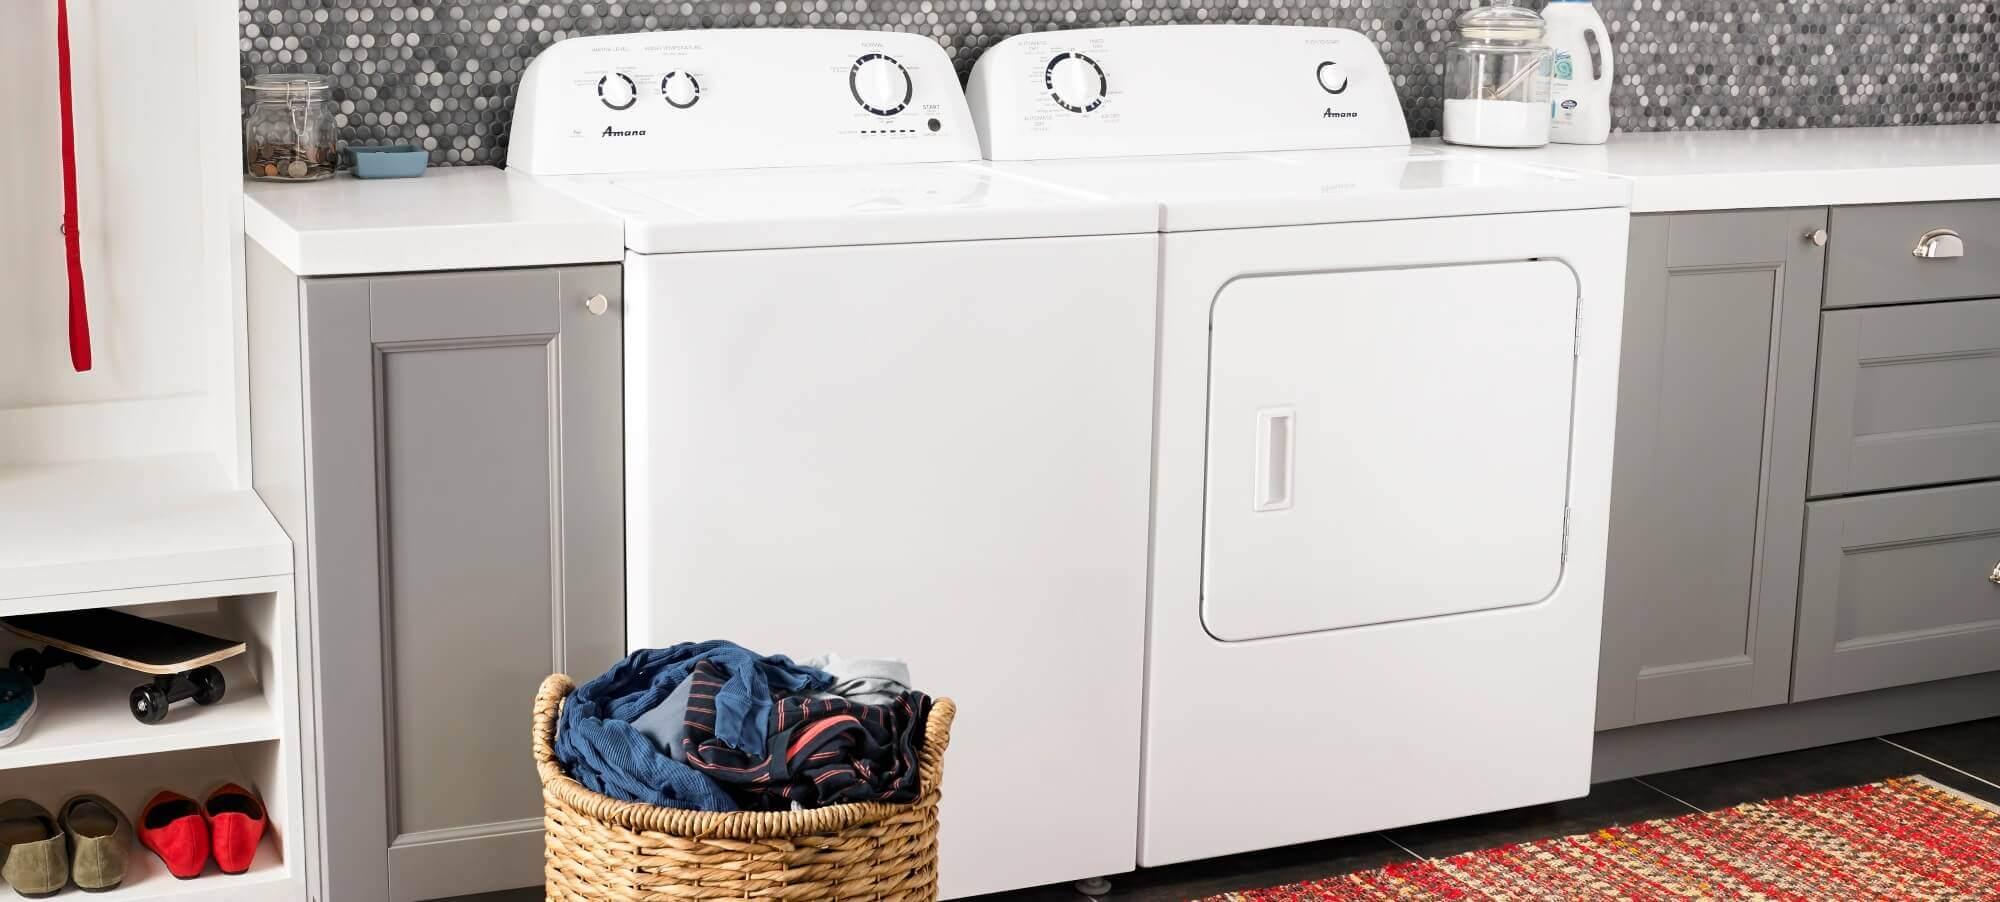 Appliances Washers Dryers Refrigerators Ovens Ranges